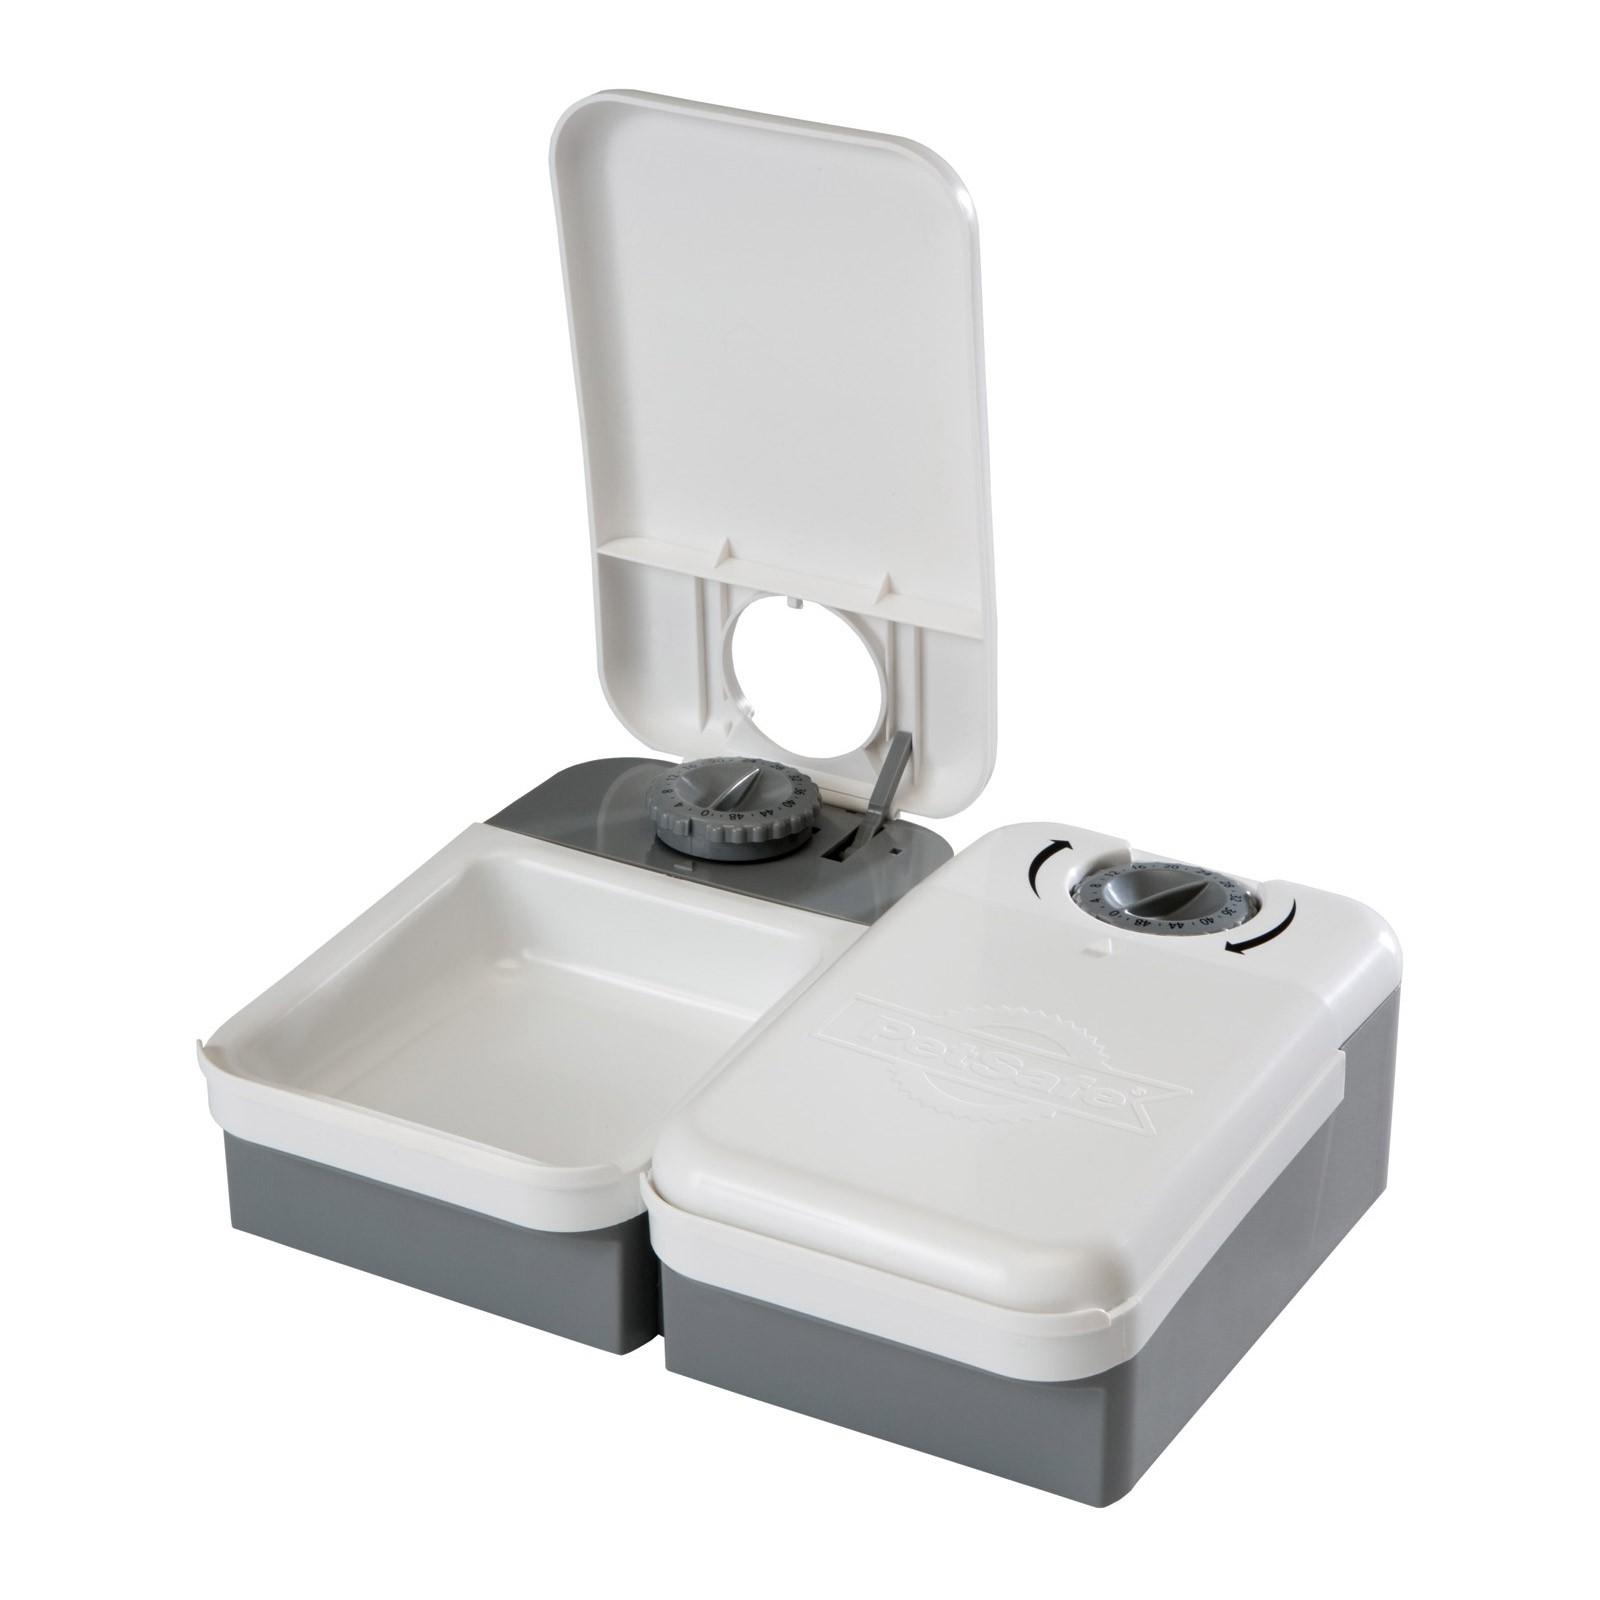 PetSafe Futterautomat / Futterspender für 2 Mahlzeiten PF2-19